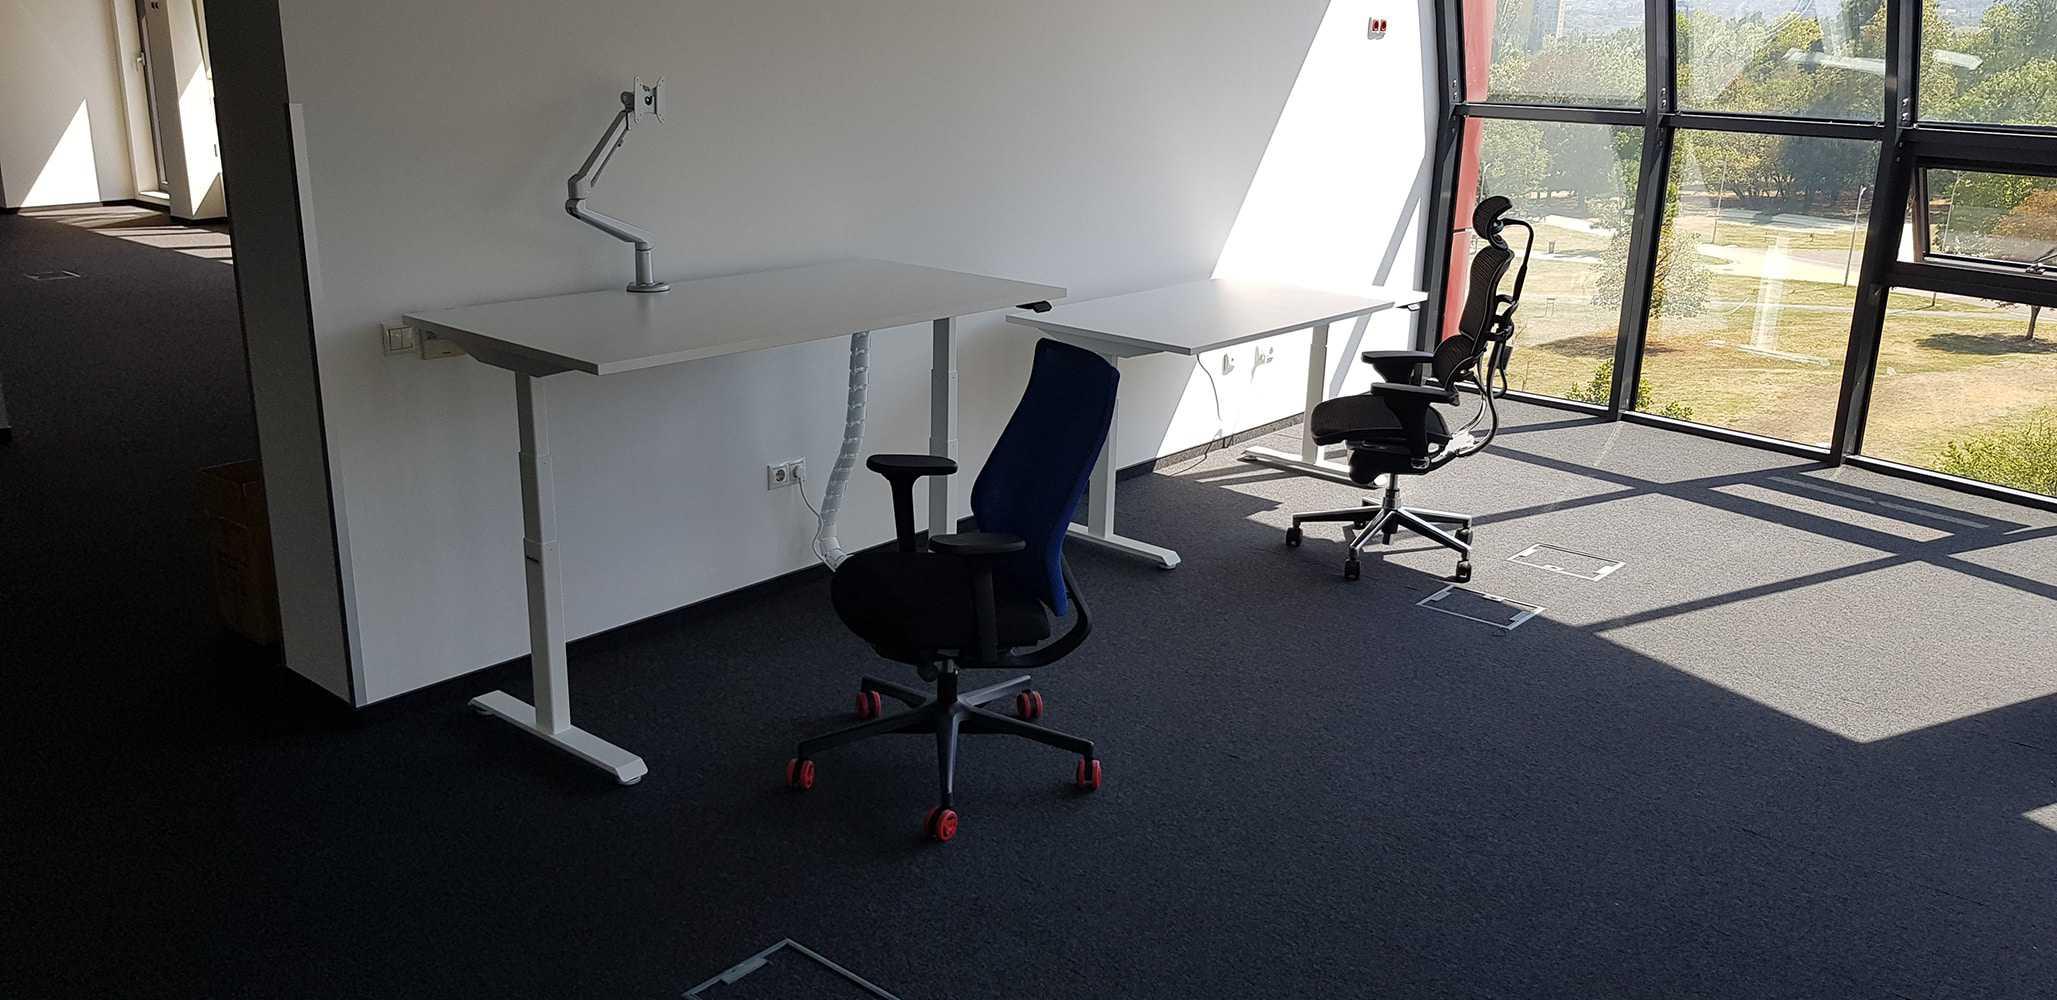 Sit-stand desks BulDesk Pro with monitor stands BulDesk Pro Arm